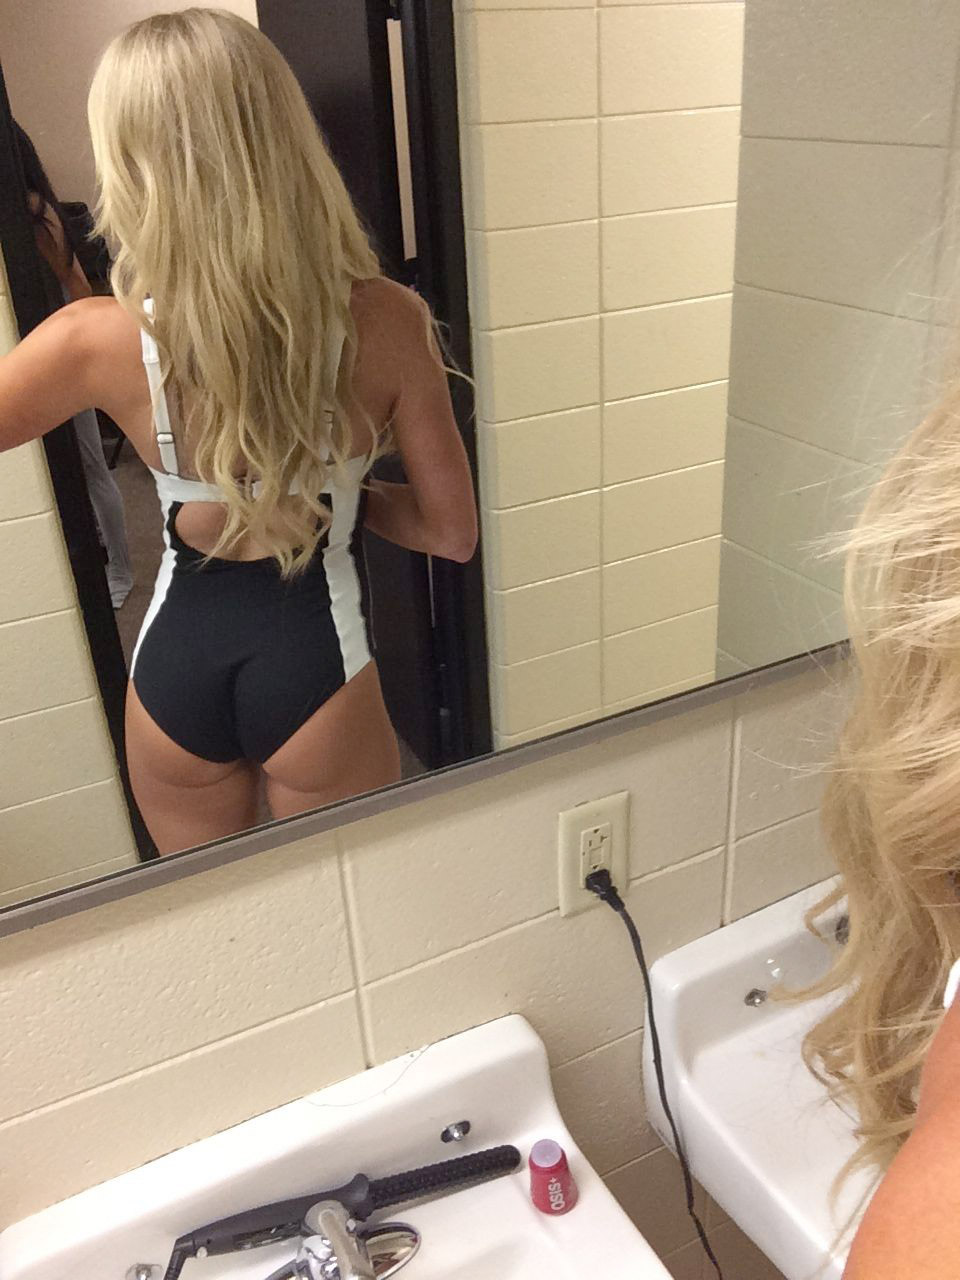 WWE Summer Rae Leaked Photos, Selfies, Bikini and Nude Pics